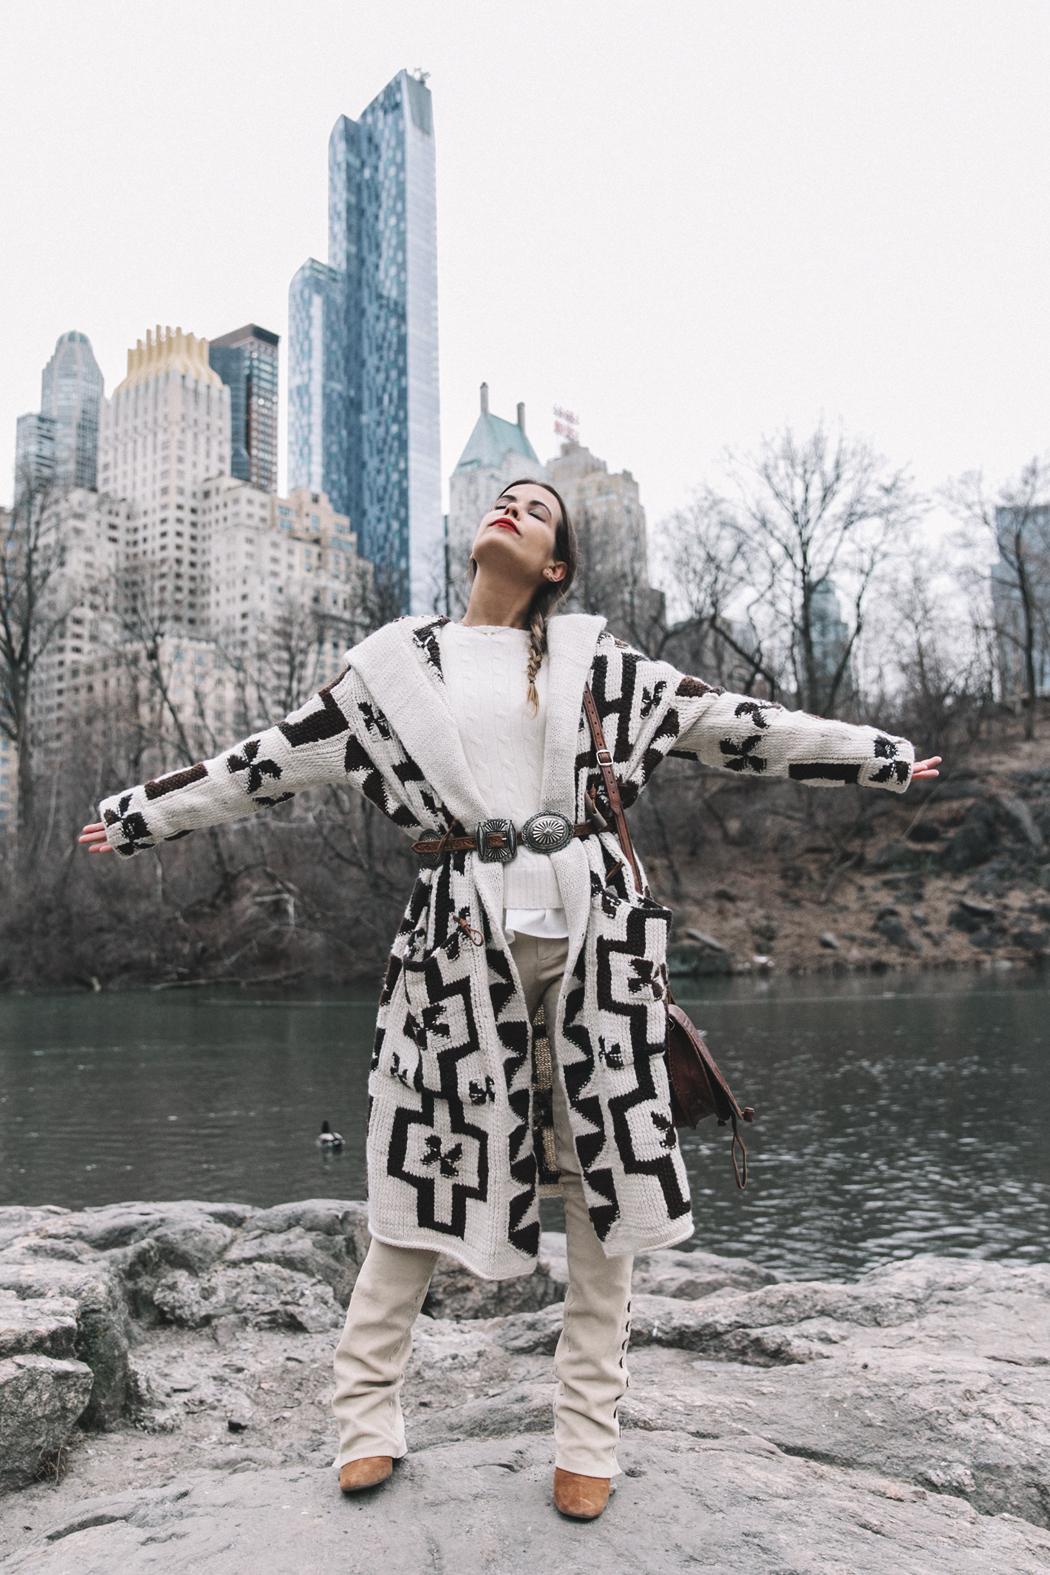 Polo_Ralph_Lauren_Collage_Vintage-Street_Style-NYFW-New_York_Fashion_Week-Knit_Jacket-Cream_Trousers-Boho-Winter_White-19